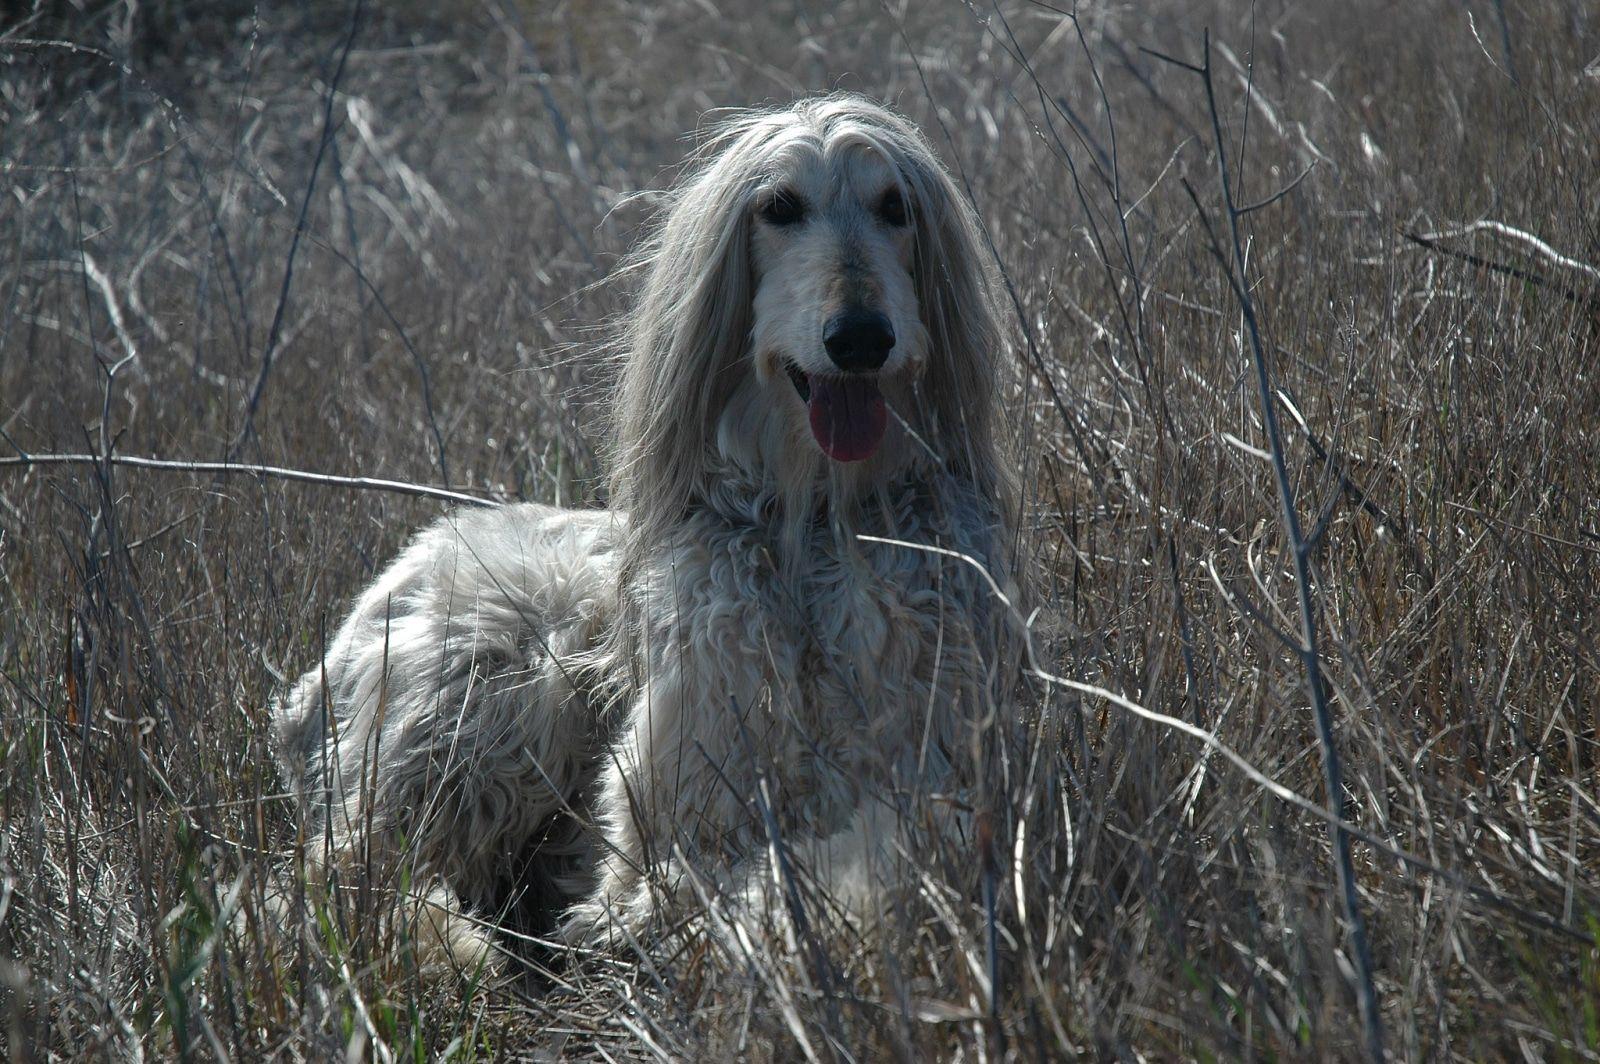 Afghanischer Windhund Afghanischer windhund, Hunderassen